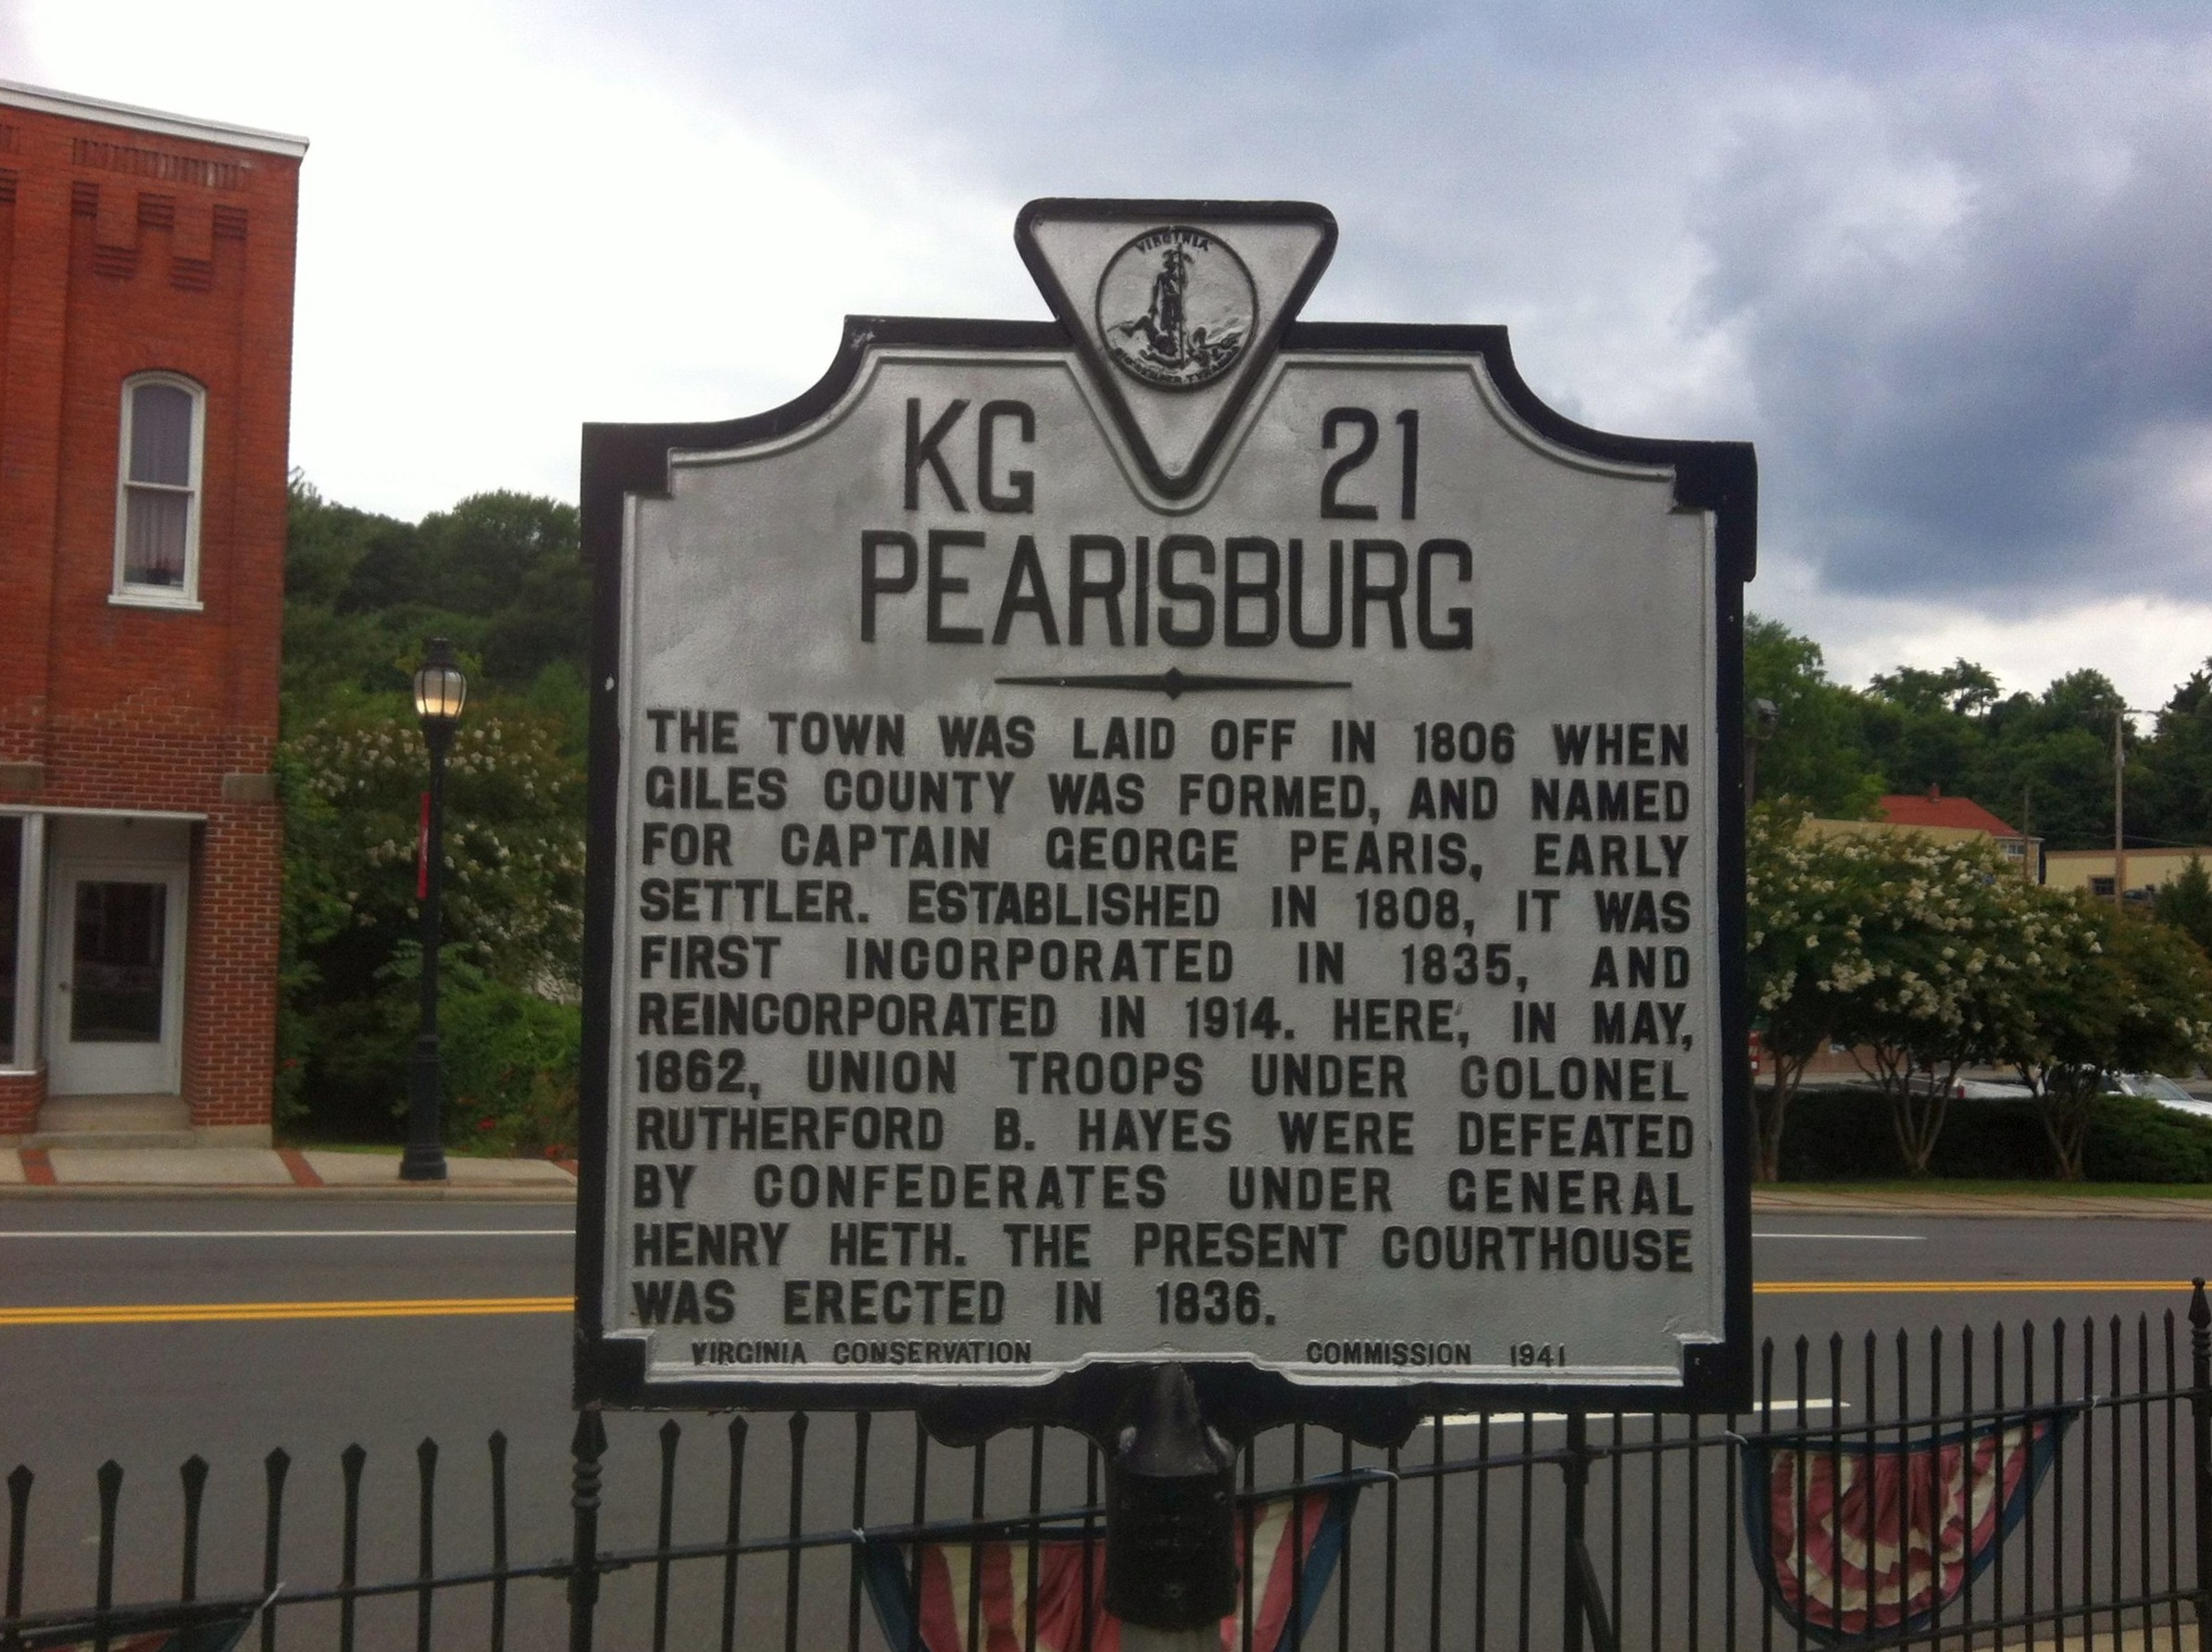 Pearisburg historic marker. Photo courtesy of brandonraykirk.com.